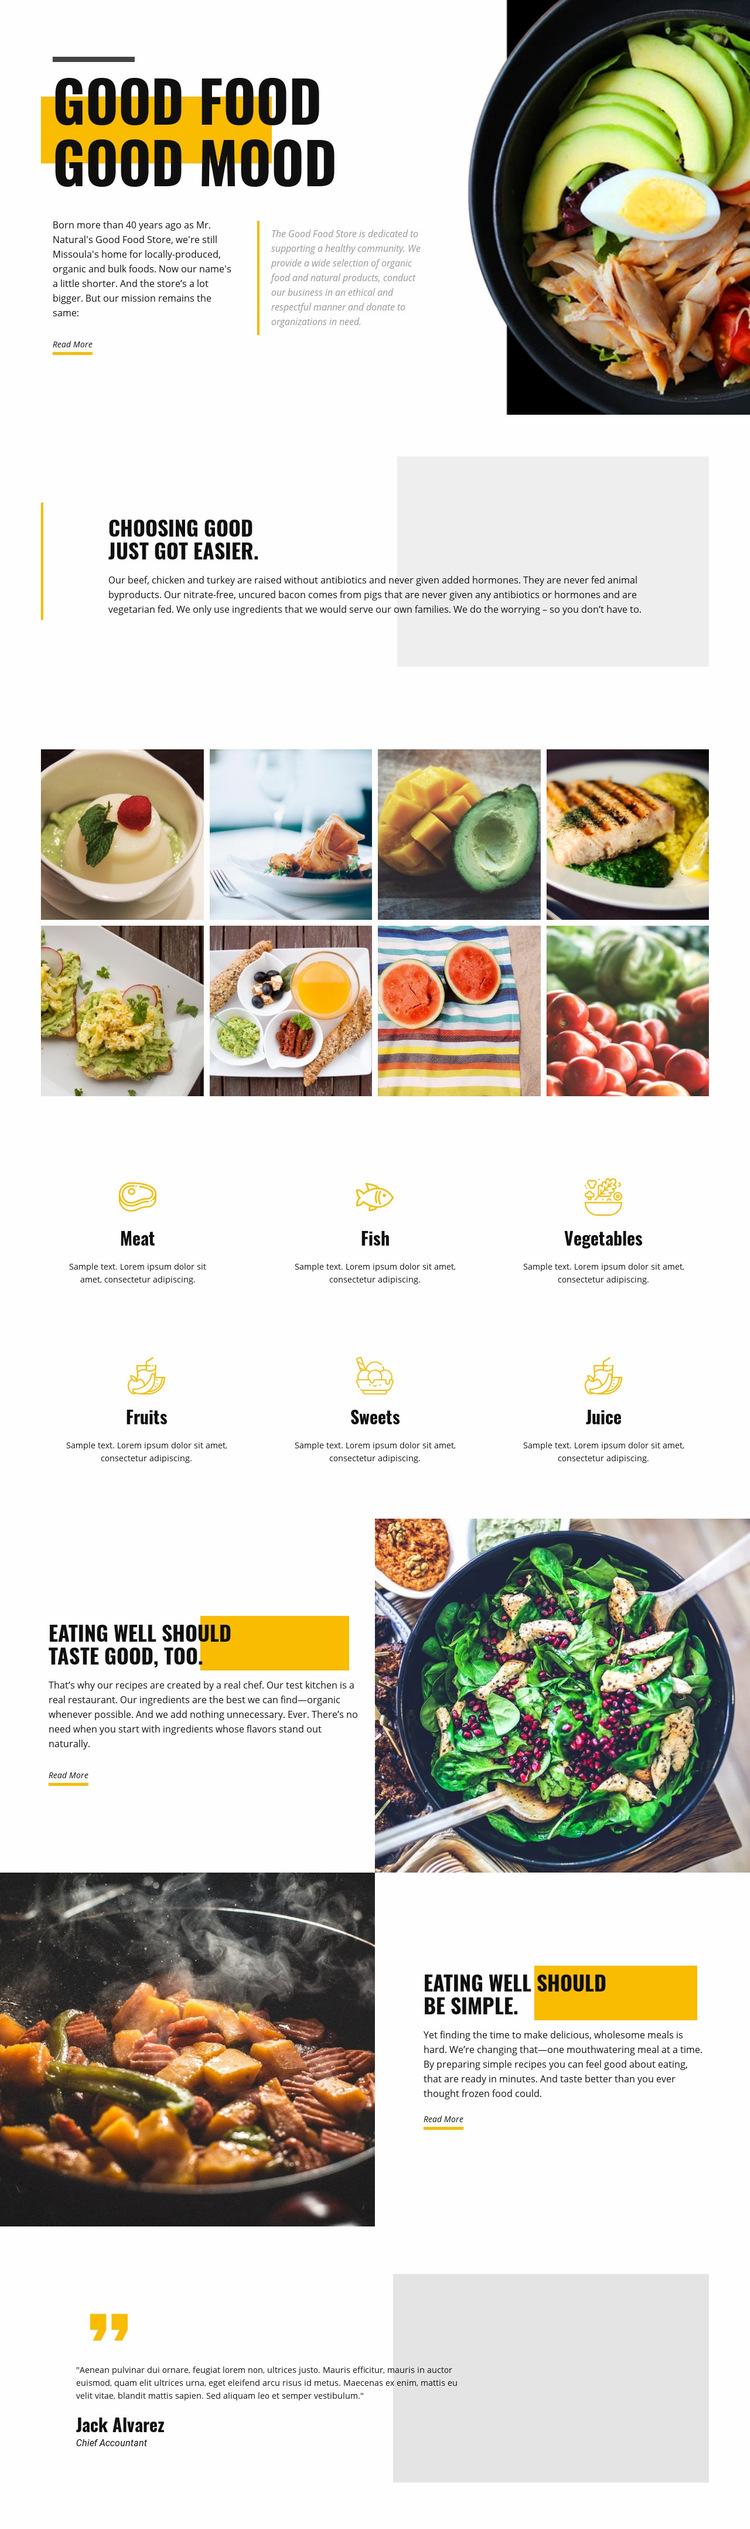 Good mood good food Web Page Design